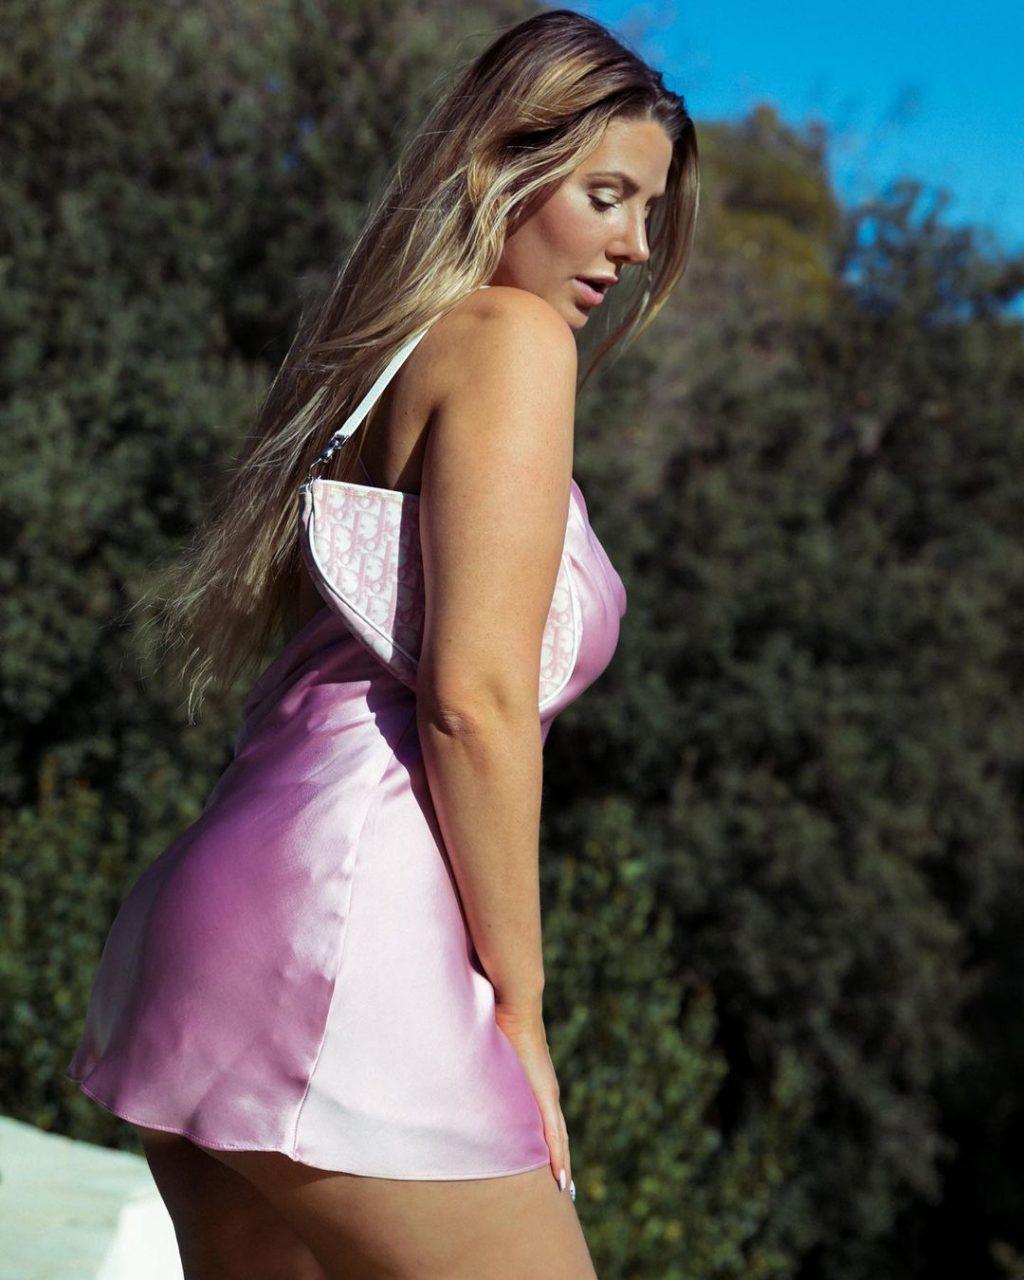 Emma CakeCup Nude & Sexy (33 Photos)